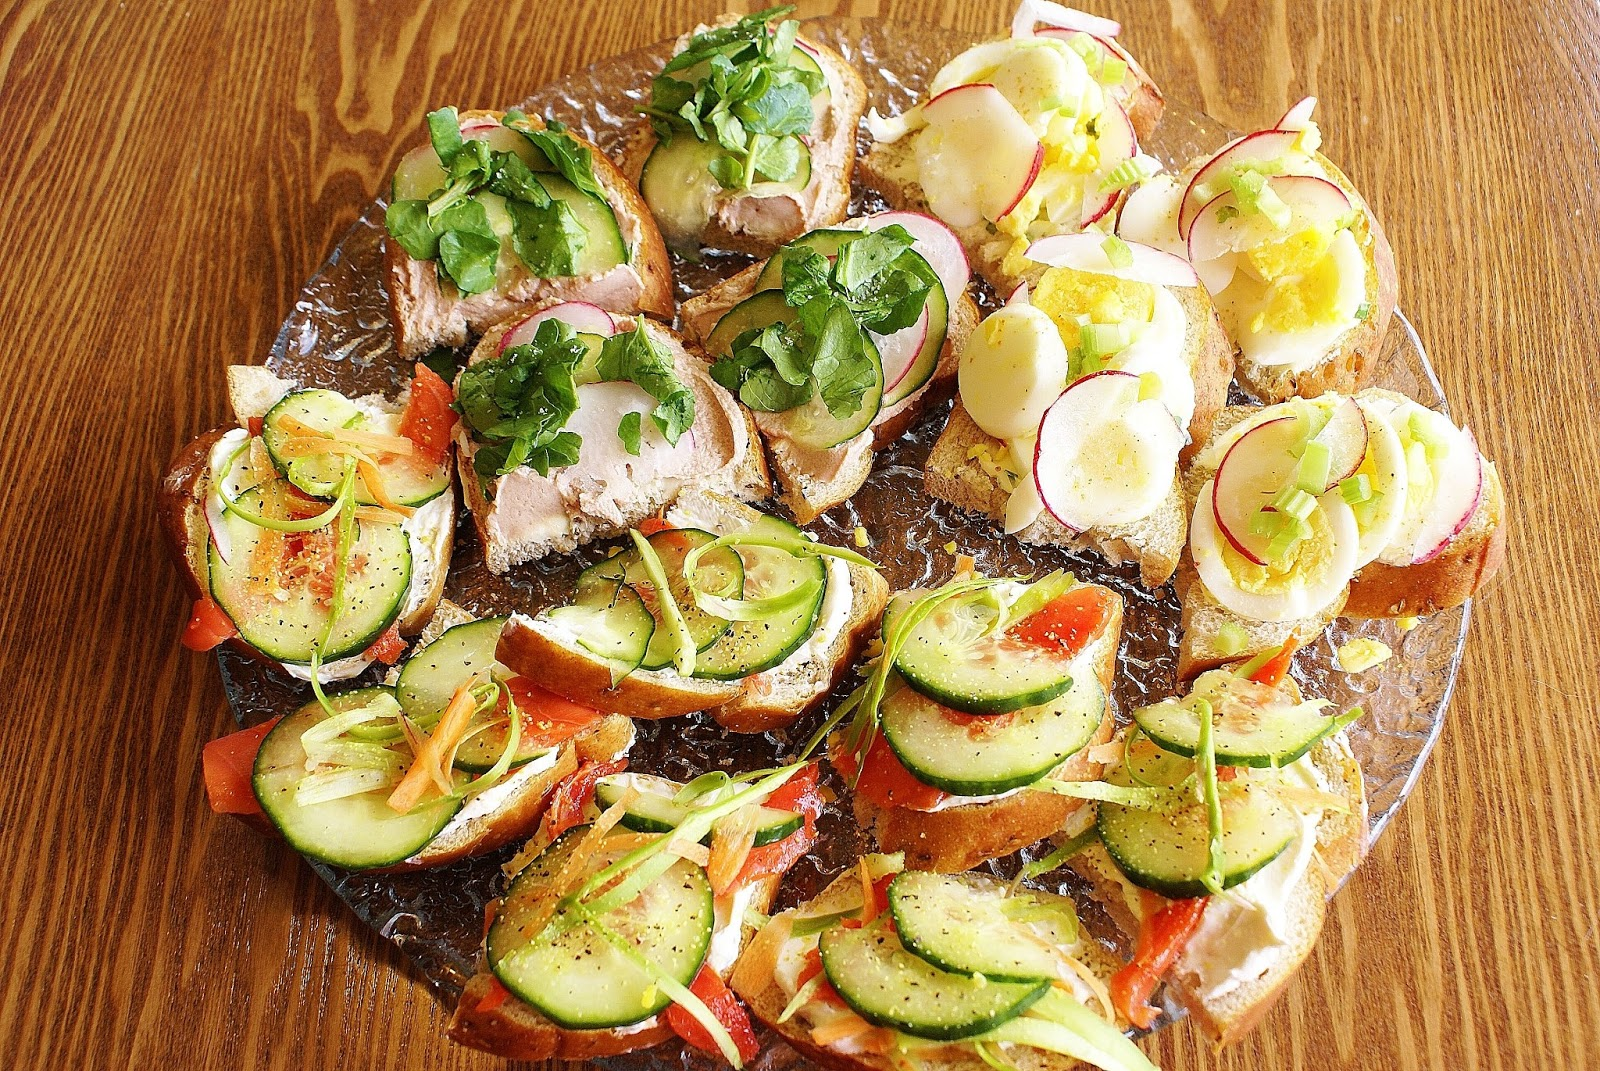 New Nordic Open-Faced Sandwiches (Smørrebrød, Smørbrød, Smörgås)